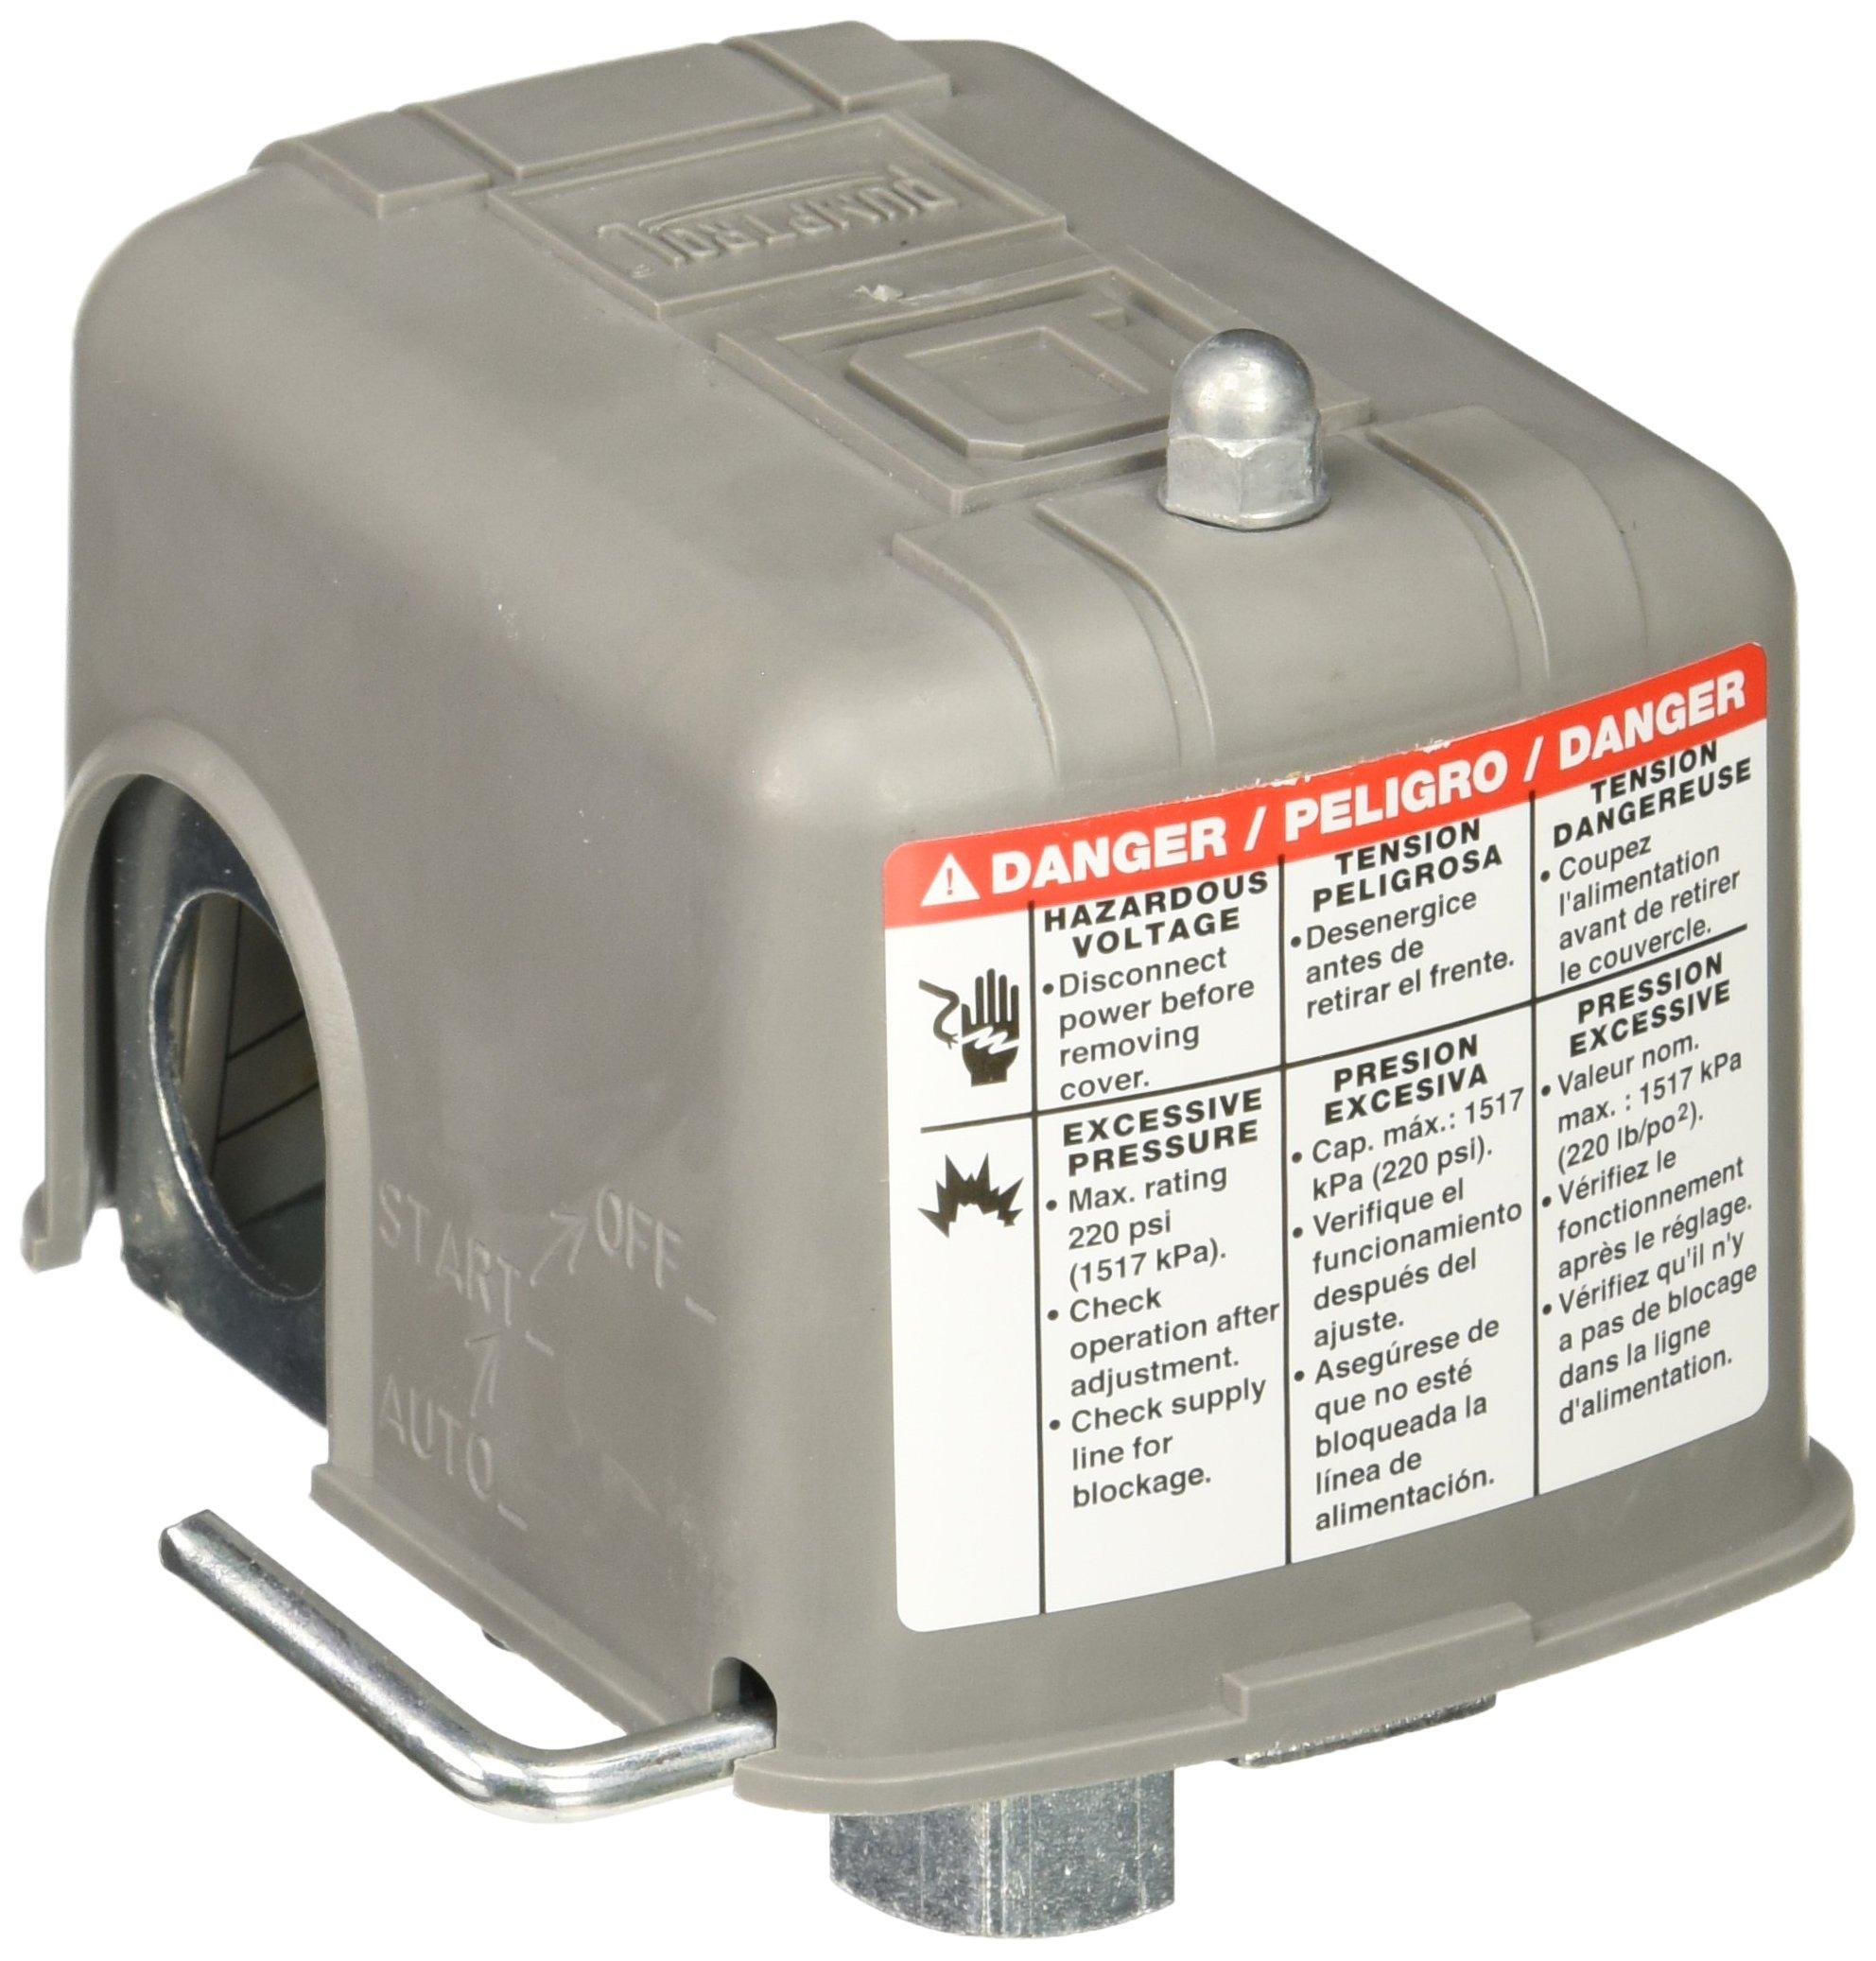 Wayne 17064-001 Square D Pressure Switch